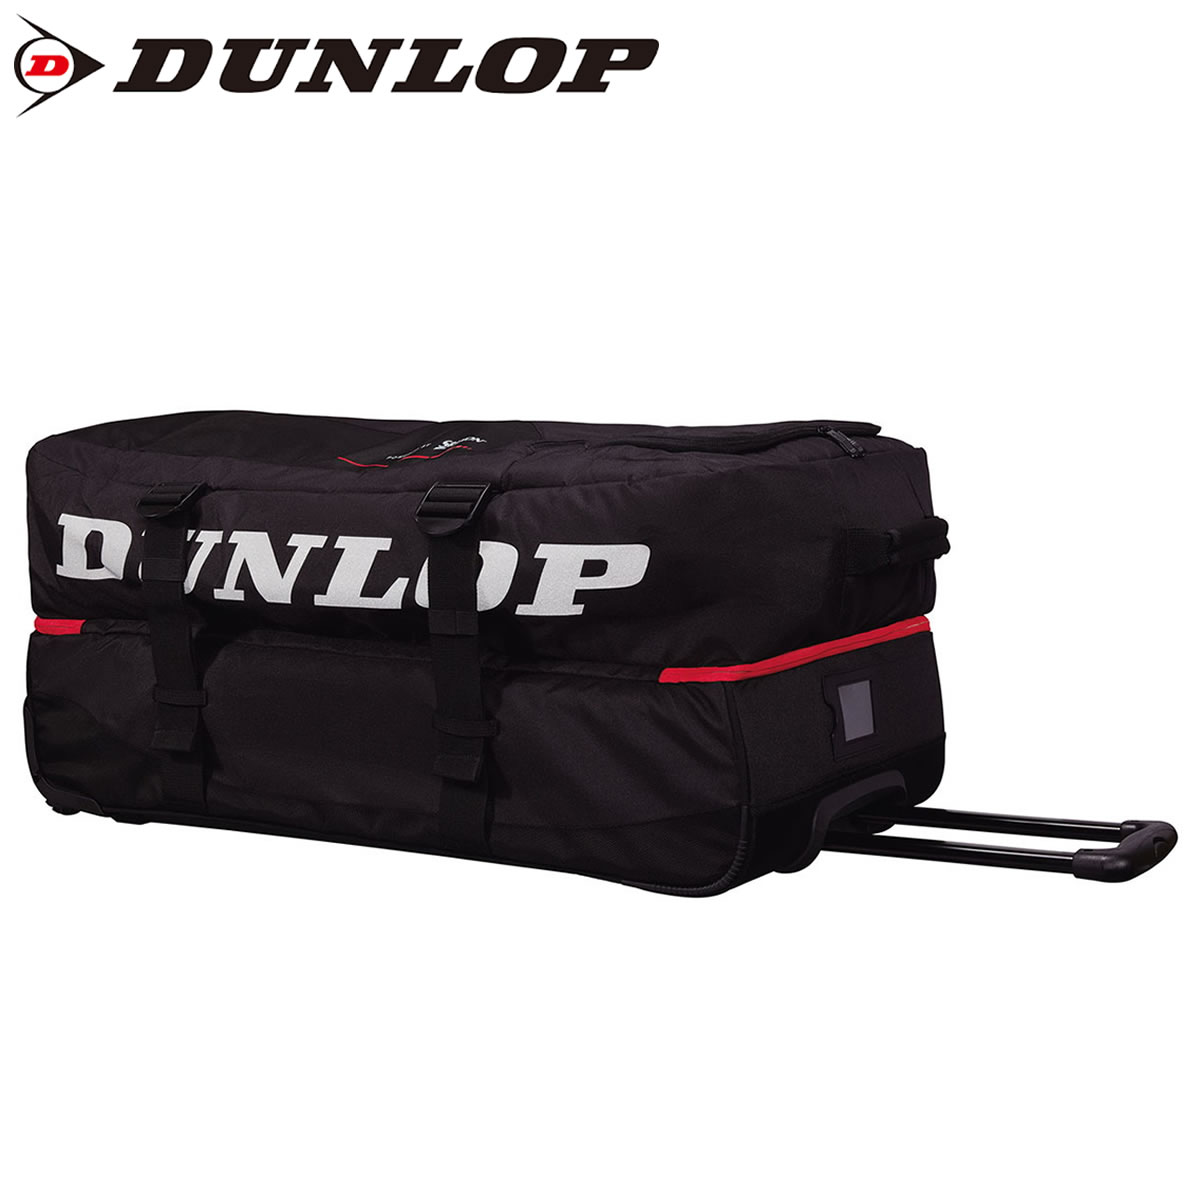 DUNLOP DPC2983 キャスターバッグ テニスバッグ 2020年春夏モデル ダンロップ 【取り寄せ】